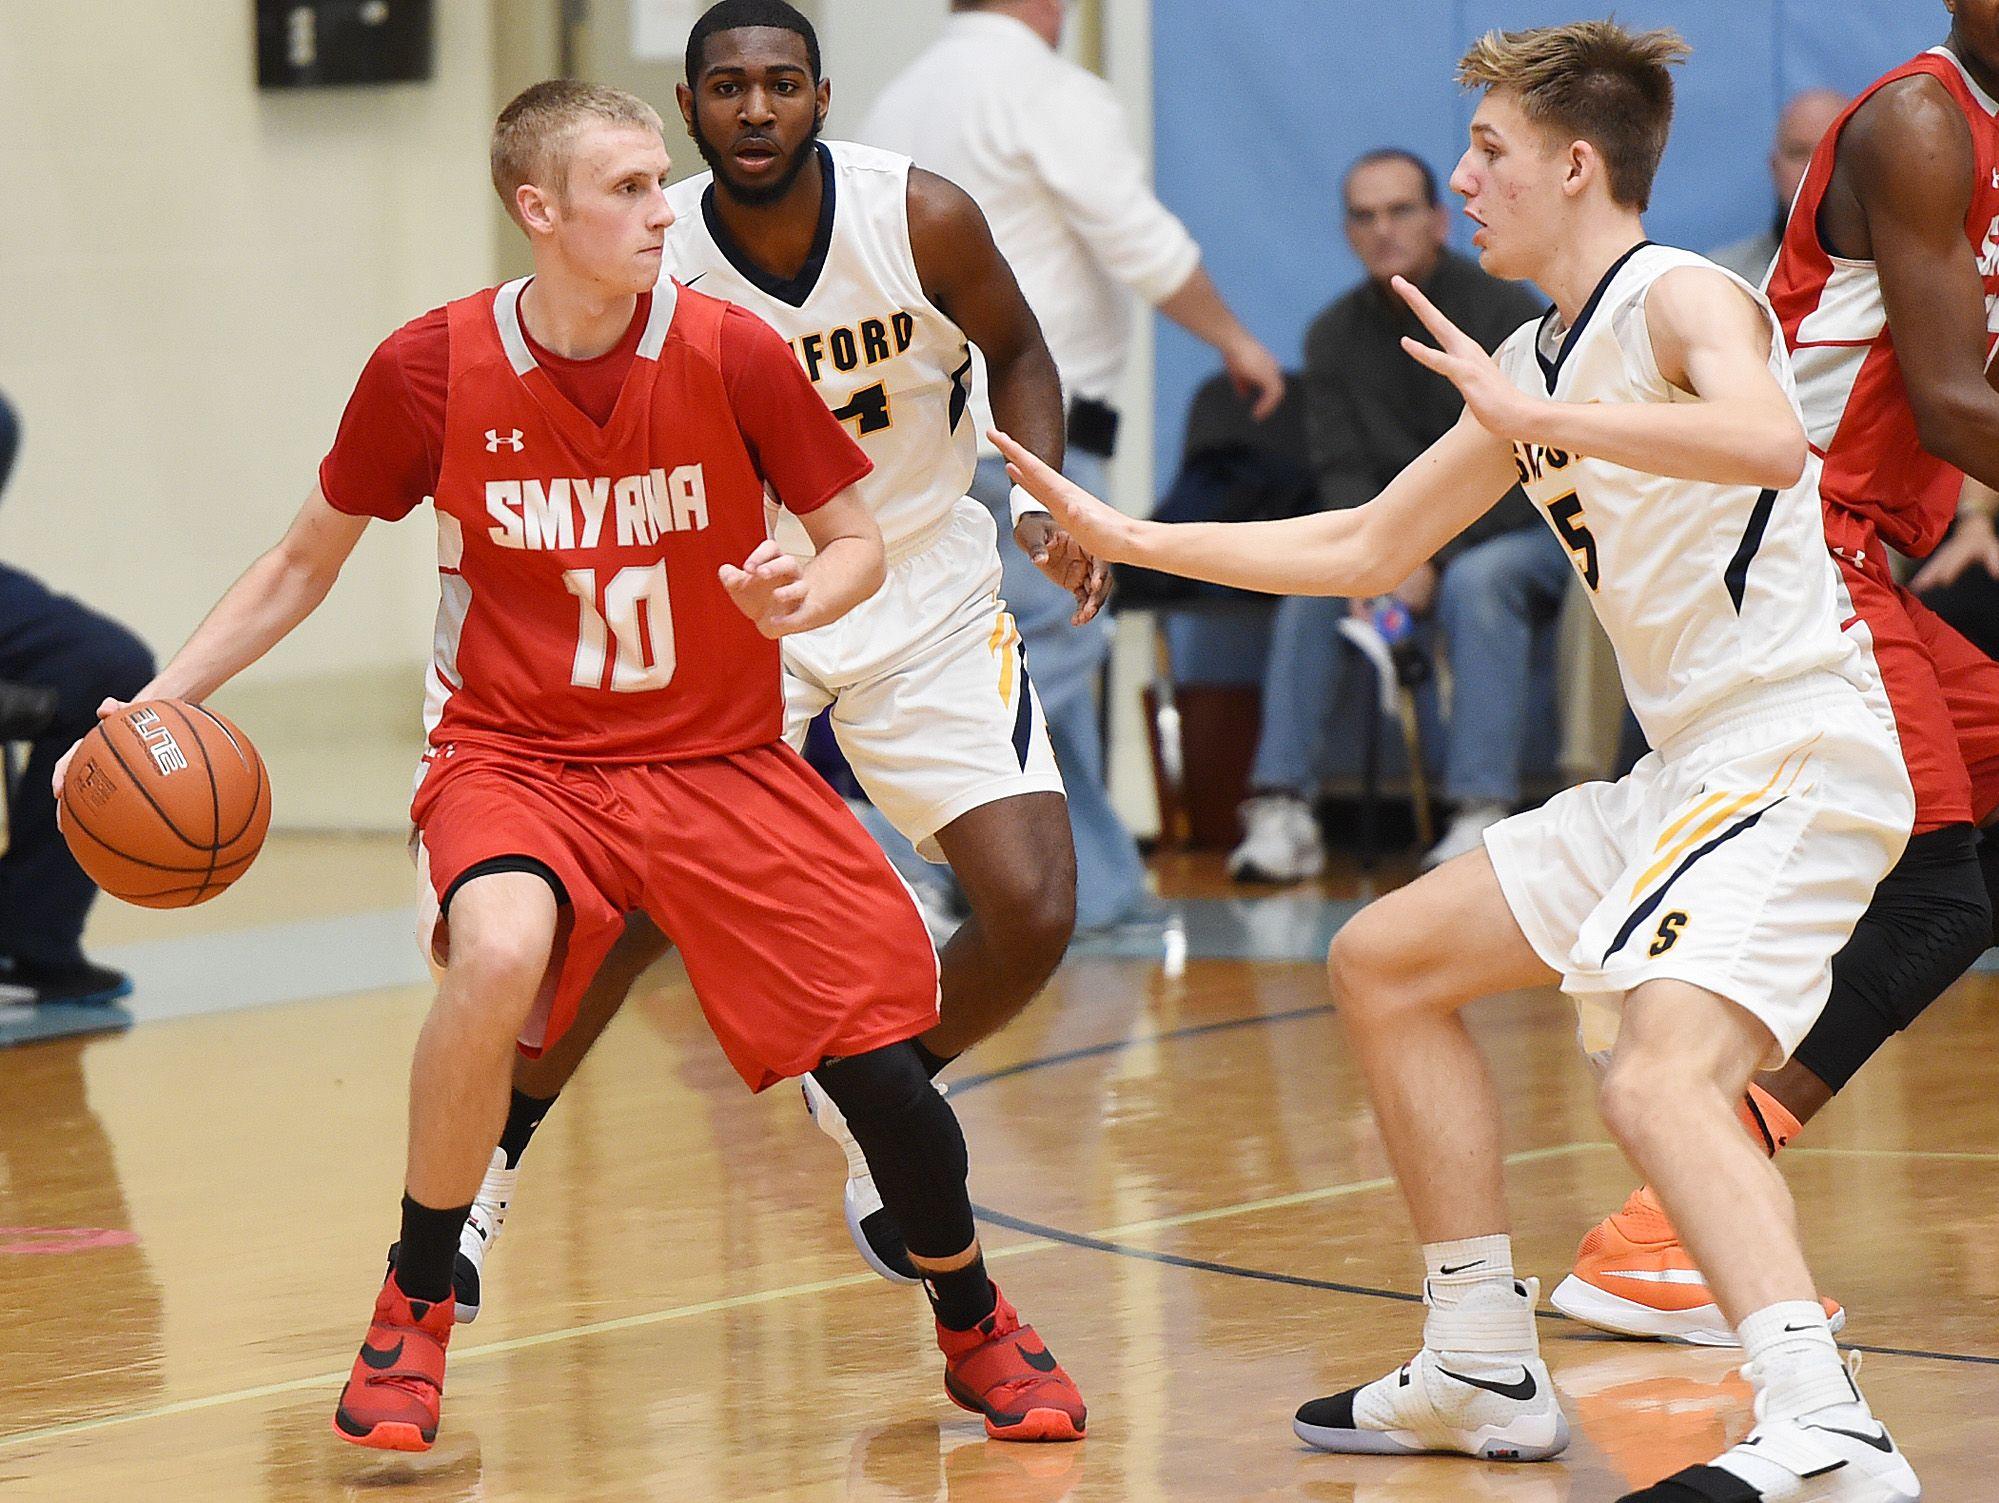 Smyrna's Caleb Matthews (10) moves the ball against the Sanford defense.